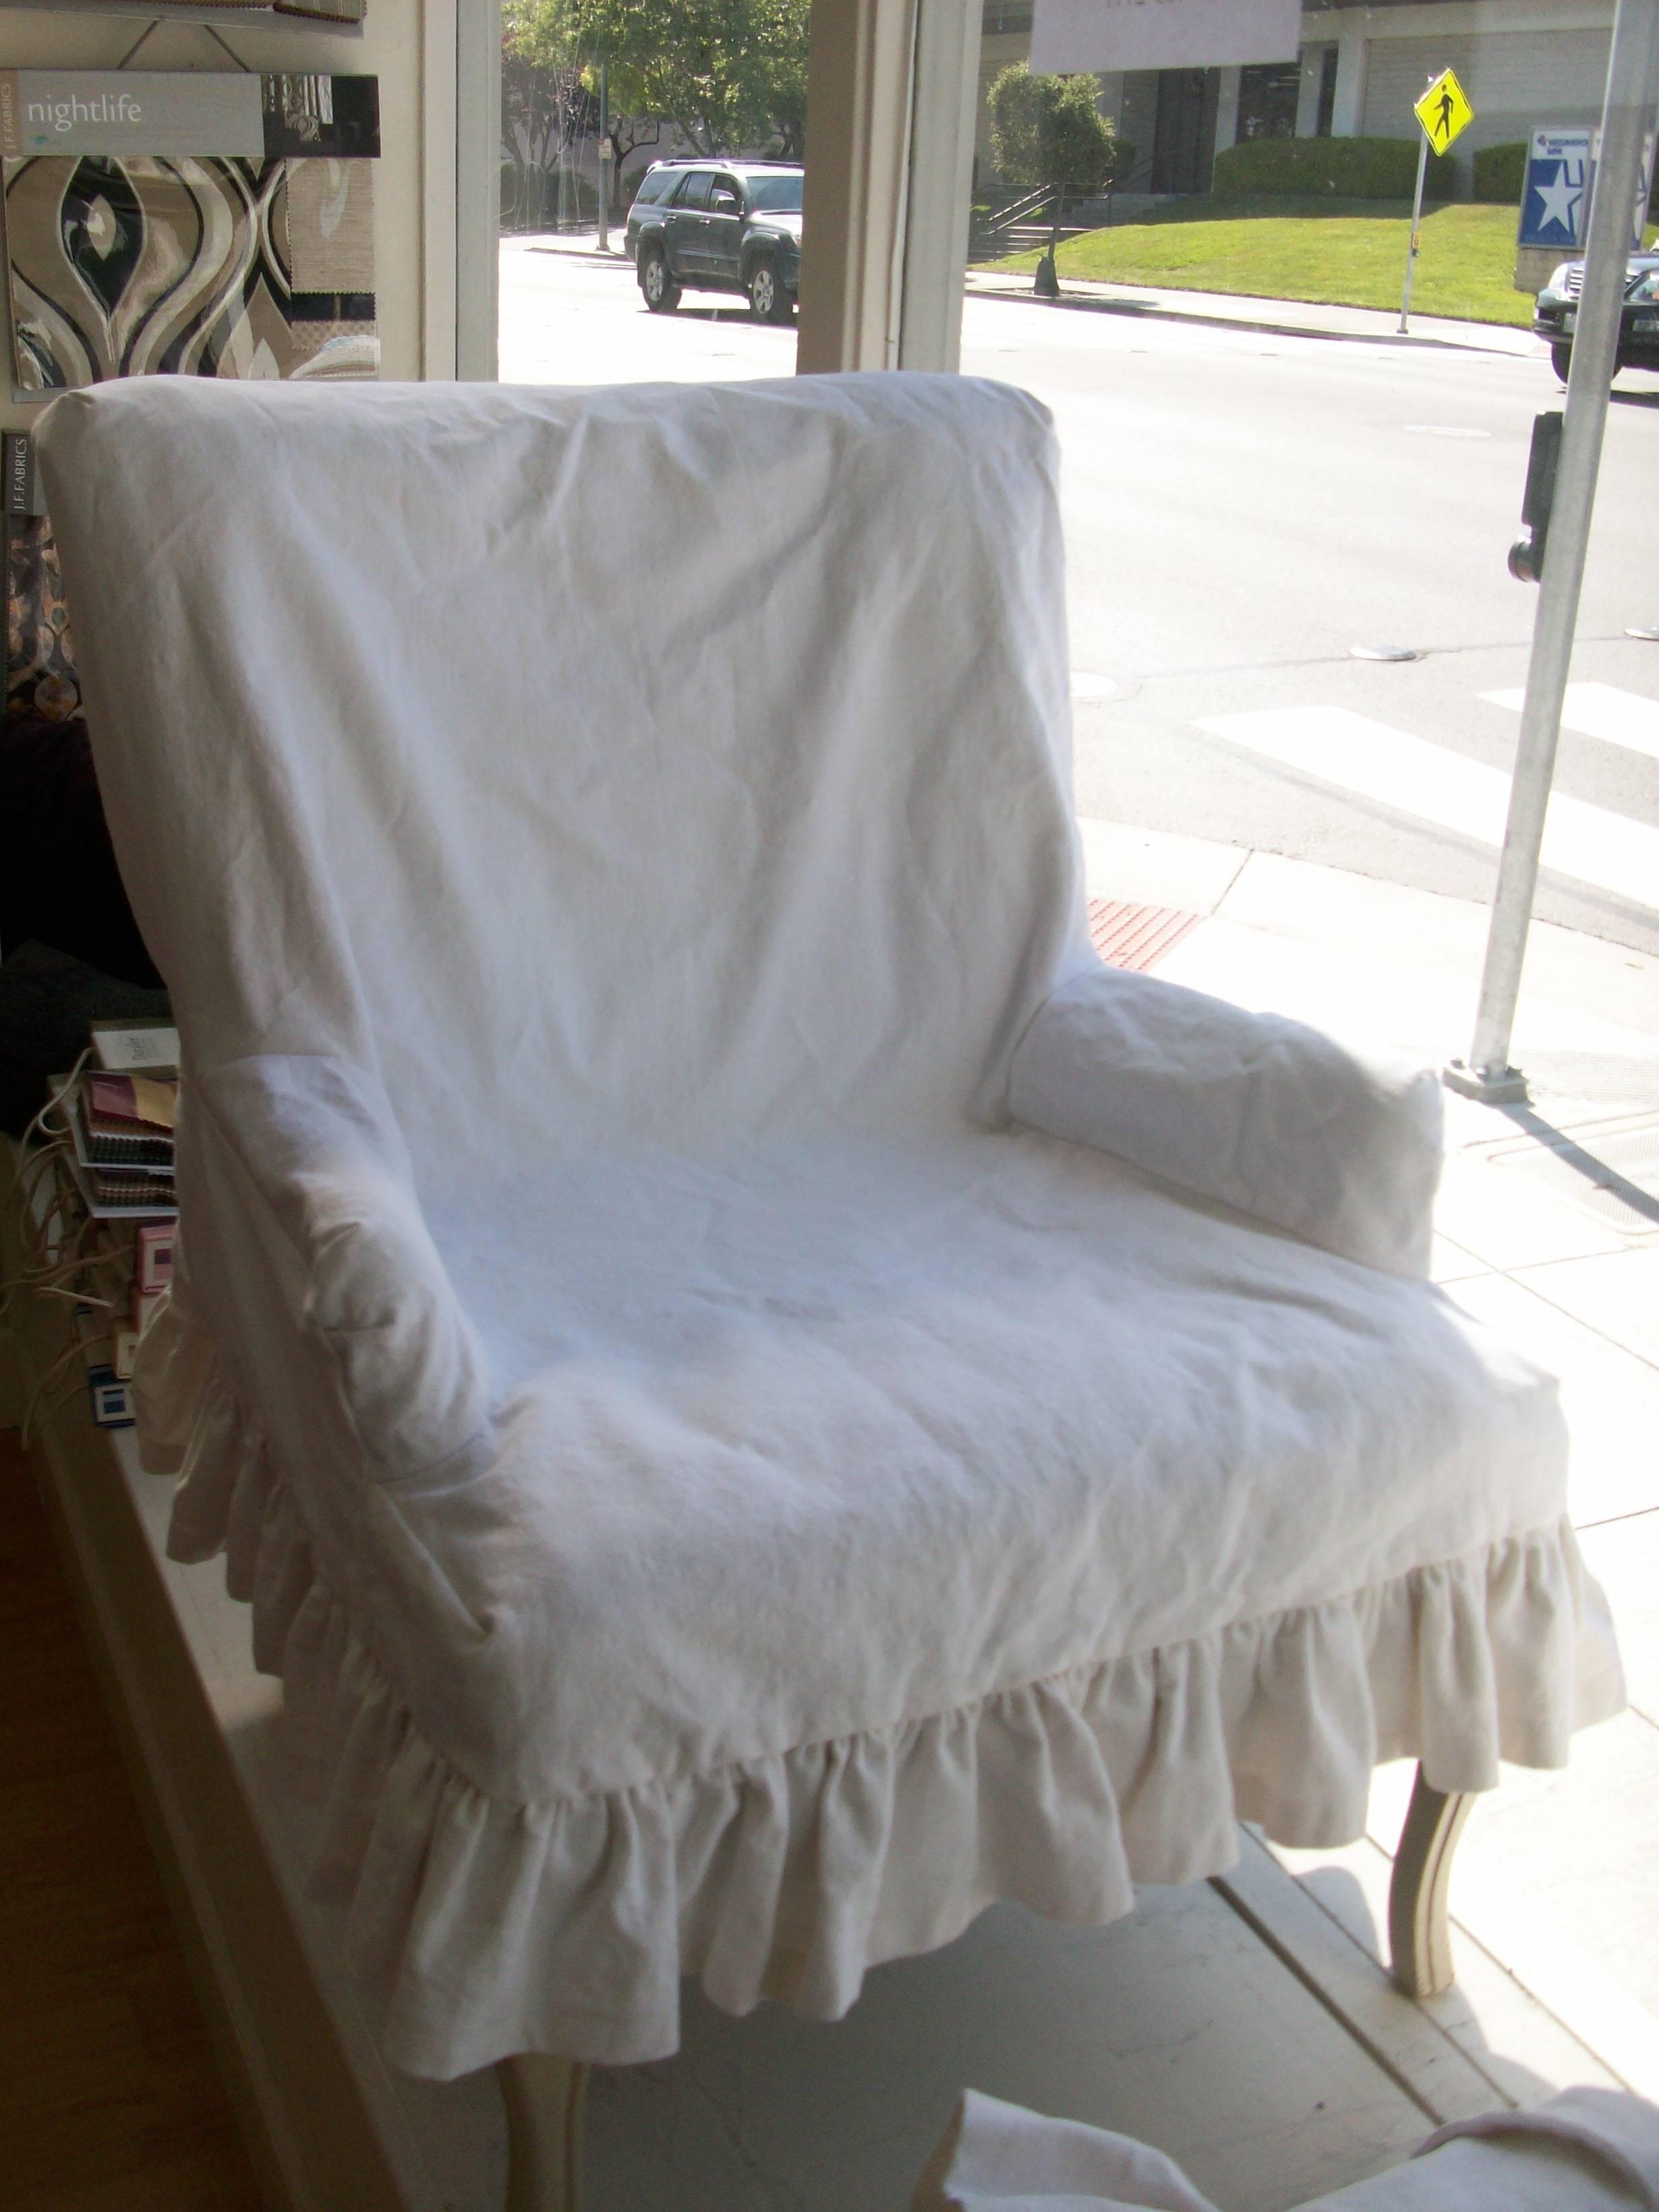 Shabby Chic Slipcover Set | Petaluma Textile & Design Within Shabby Chic Slipcovers (View 6 of 15)